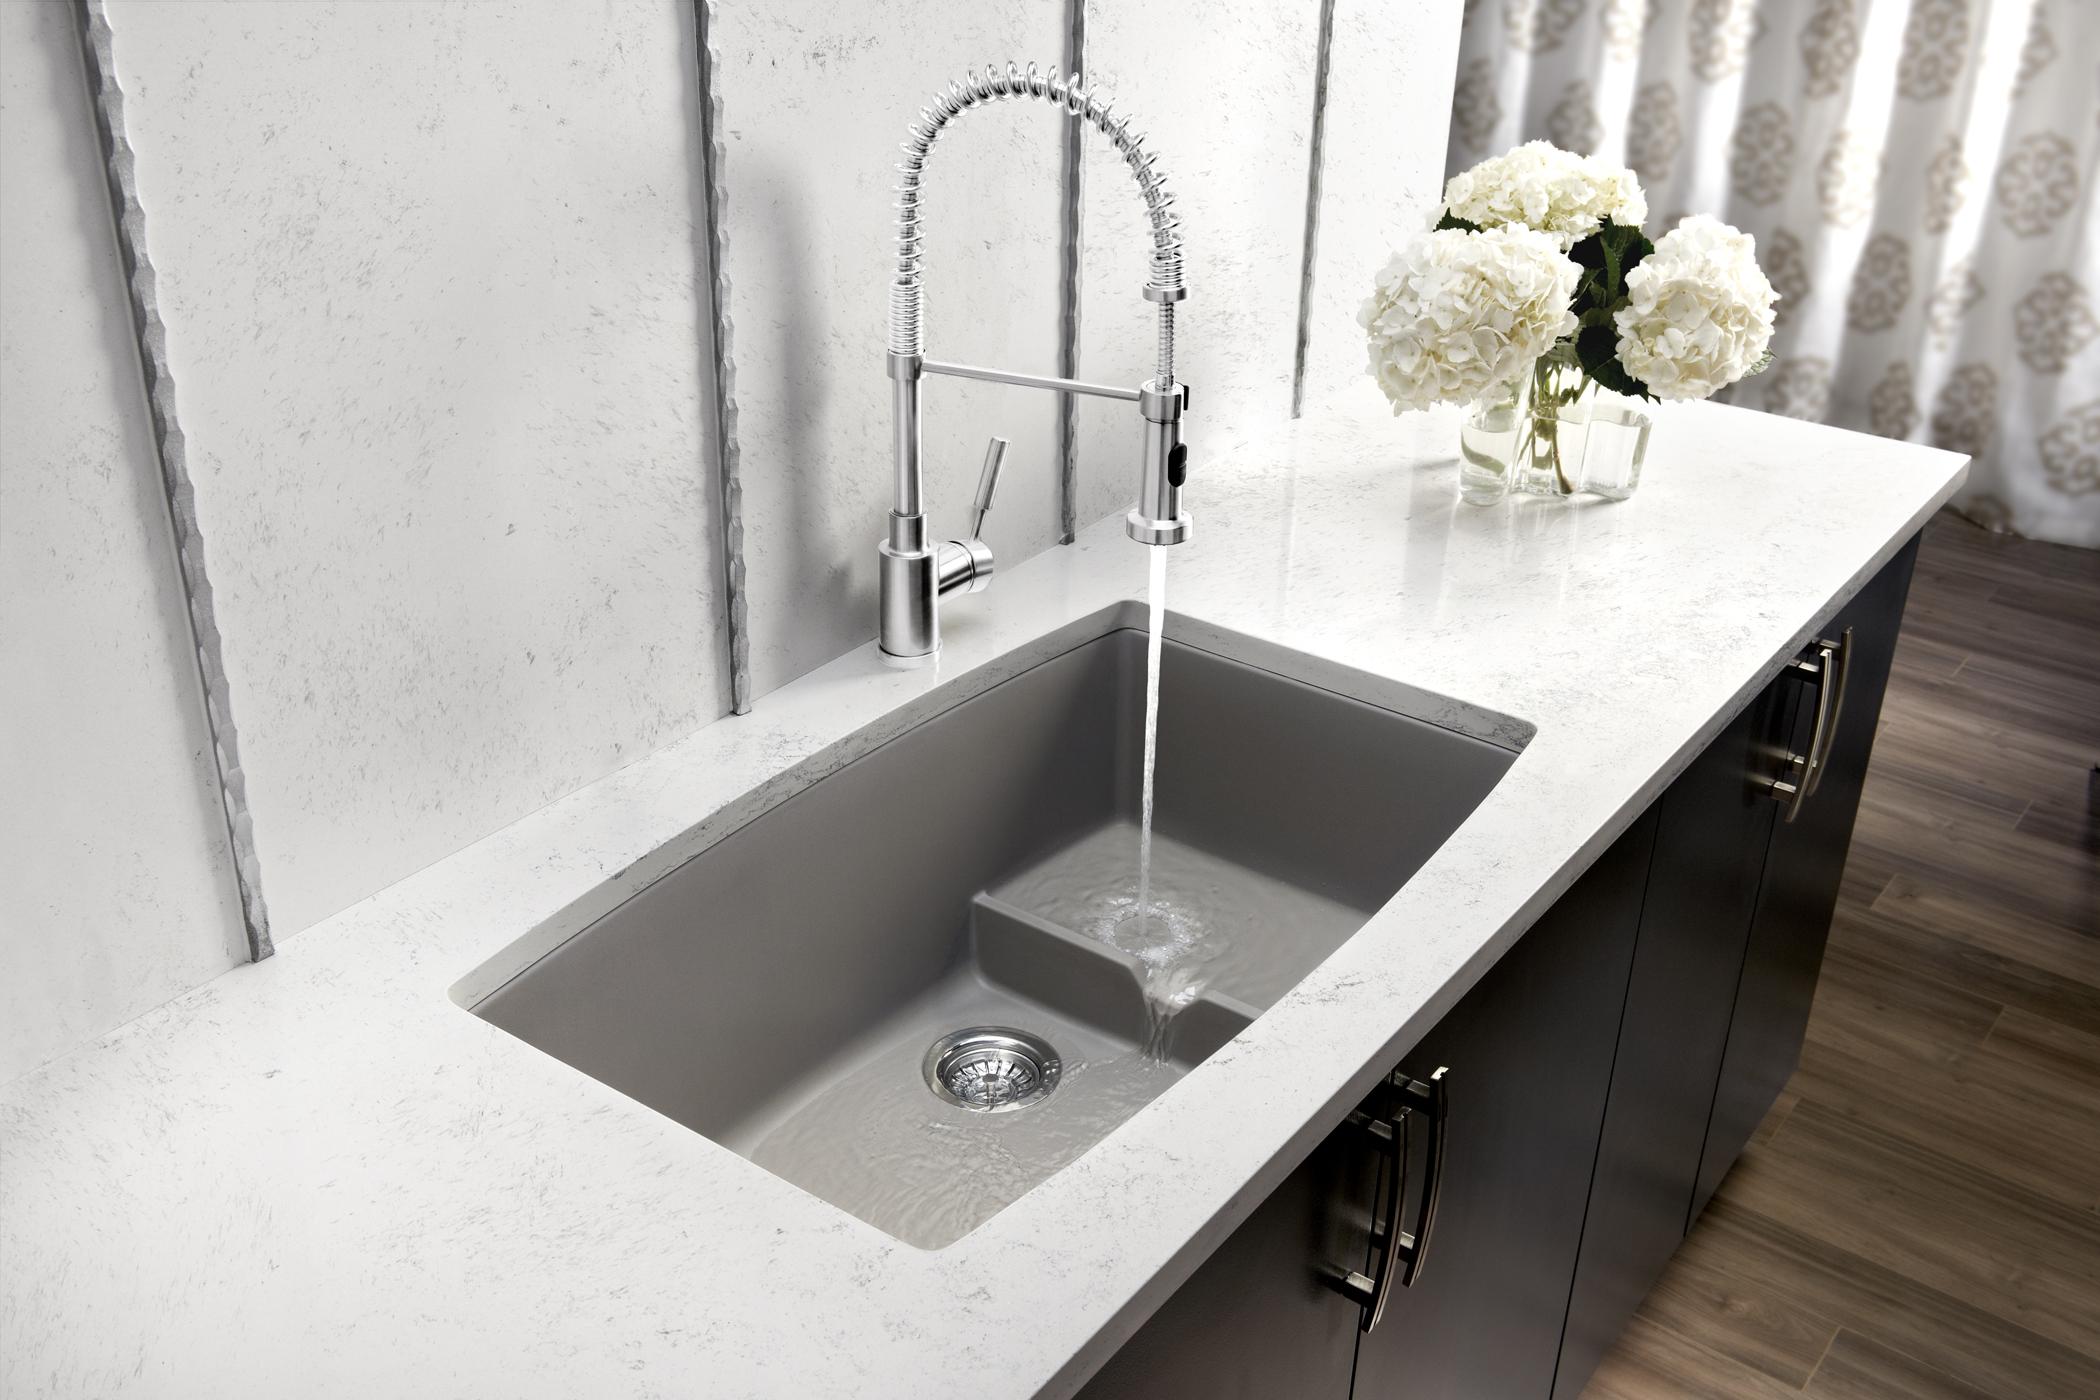 how-to-clean-silgranit-kitchen-sinks-throughout-blanco-silgranit-kitchen-sink-amazing-models-blanco-